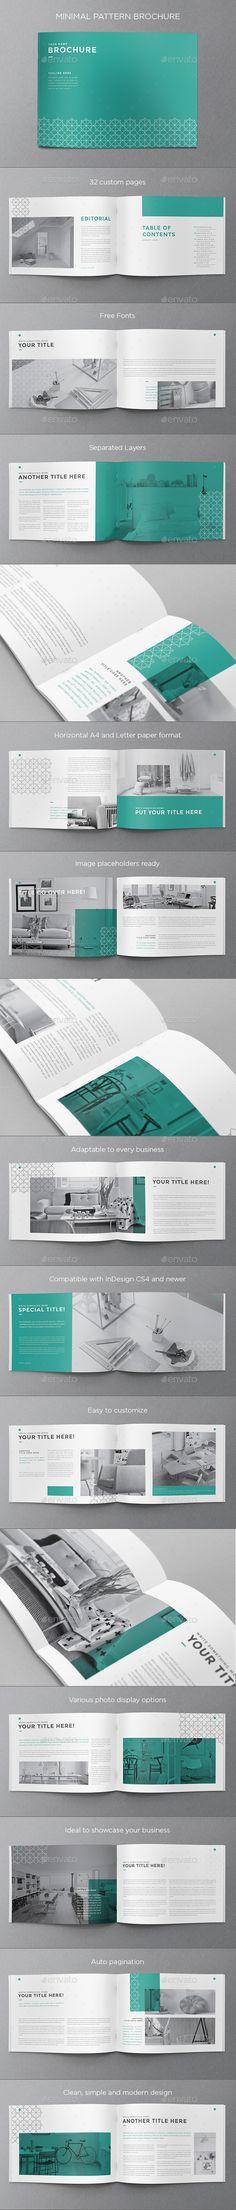 Minimal Pattern Brochure Template #design Download: http://graphicriver.net/item/minimal-pattern-brochure/12751211?ref=ksioks